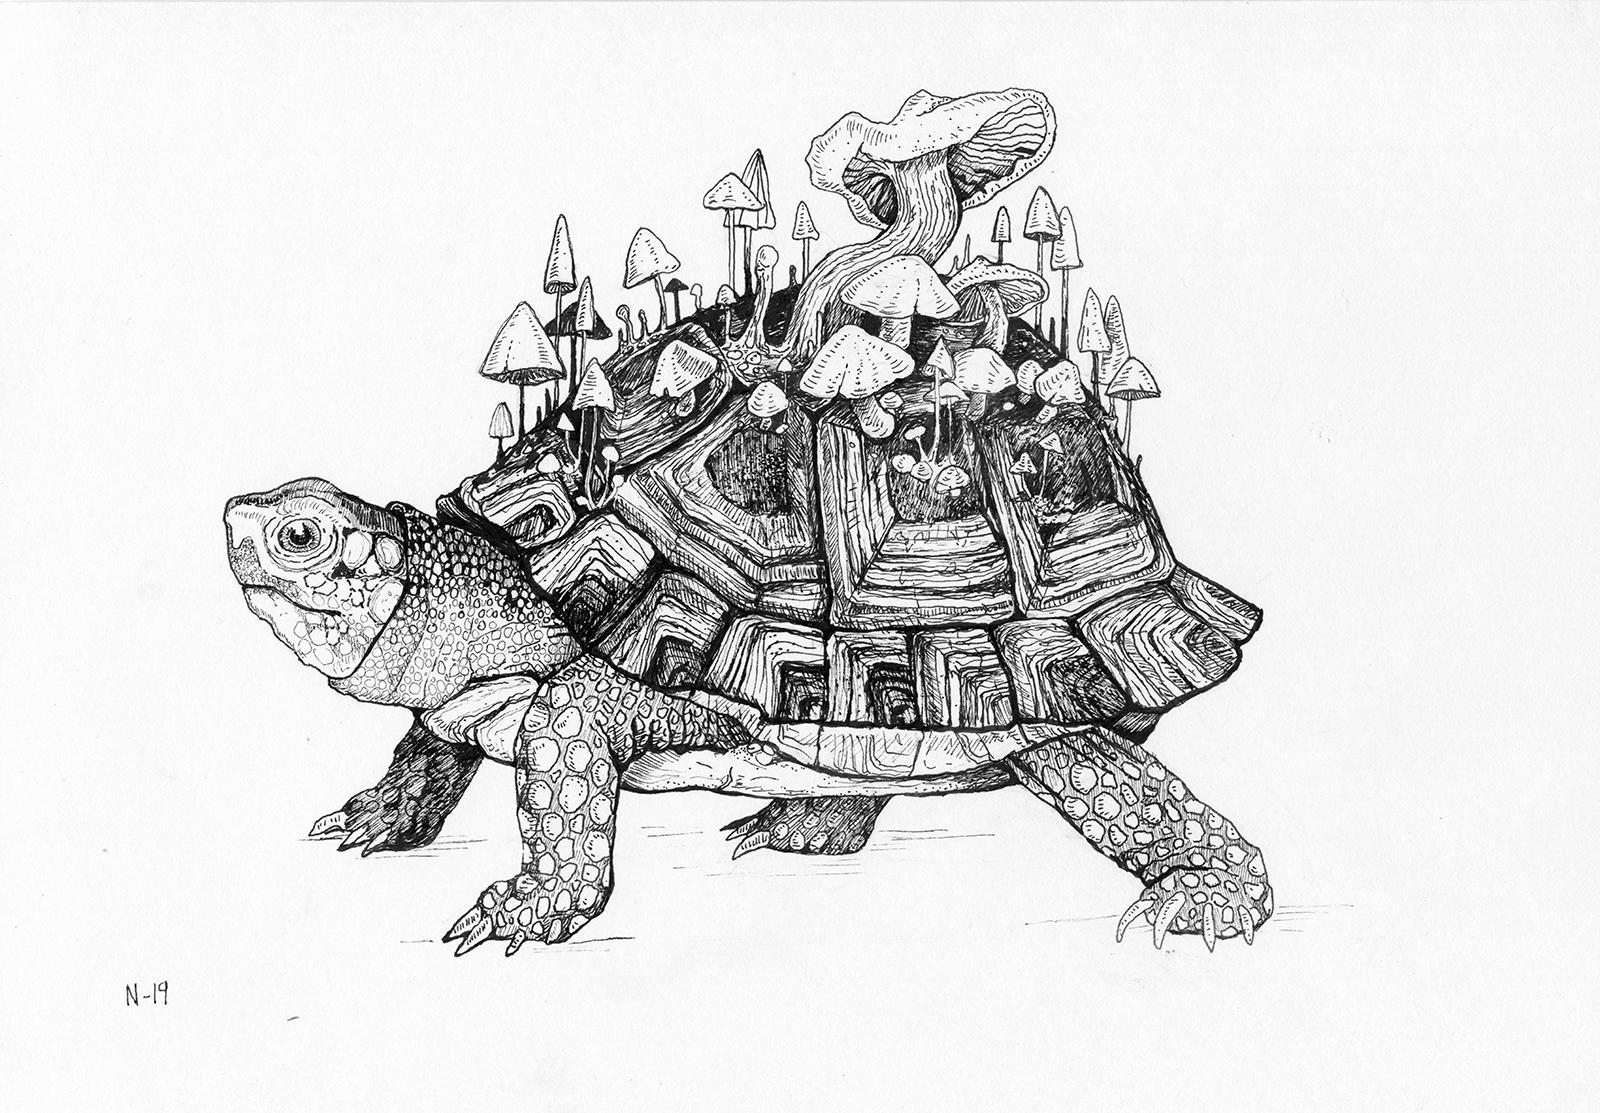 tortoise_nadja-art